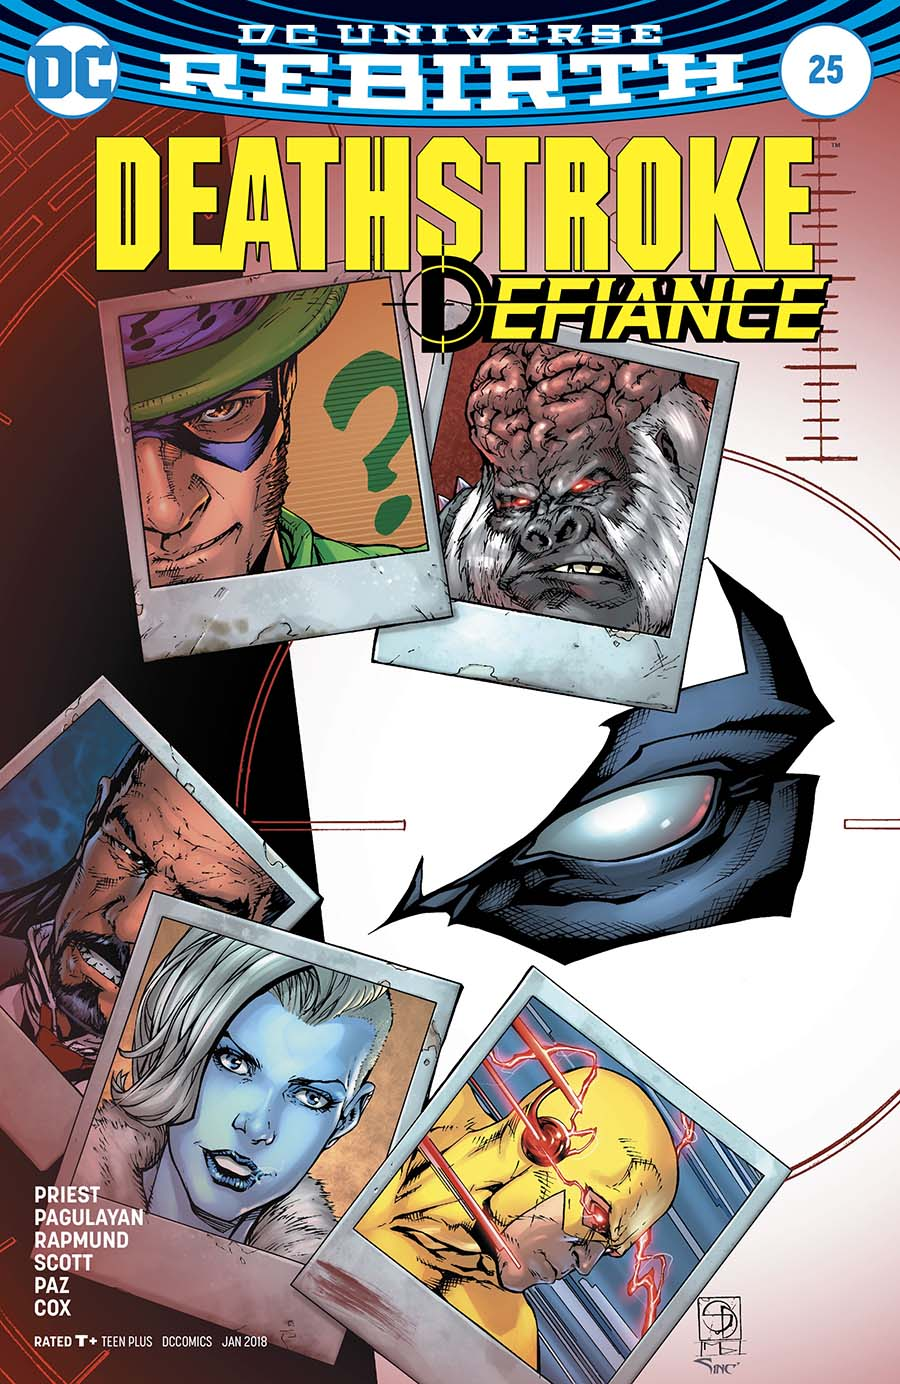 Deathstroke Vol 4 #25 Cover B Variant Shane Davis & Michelle Delecki Cover